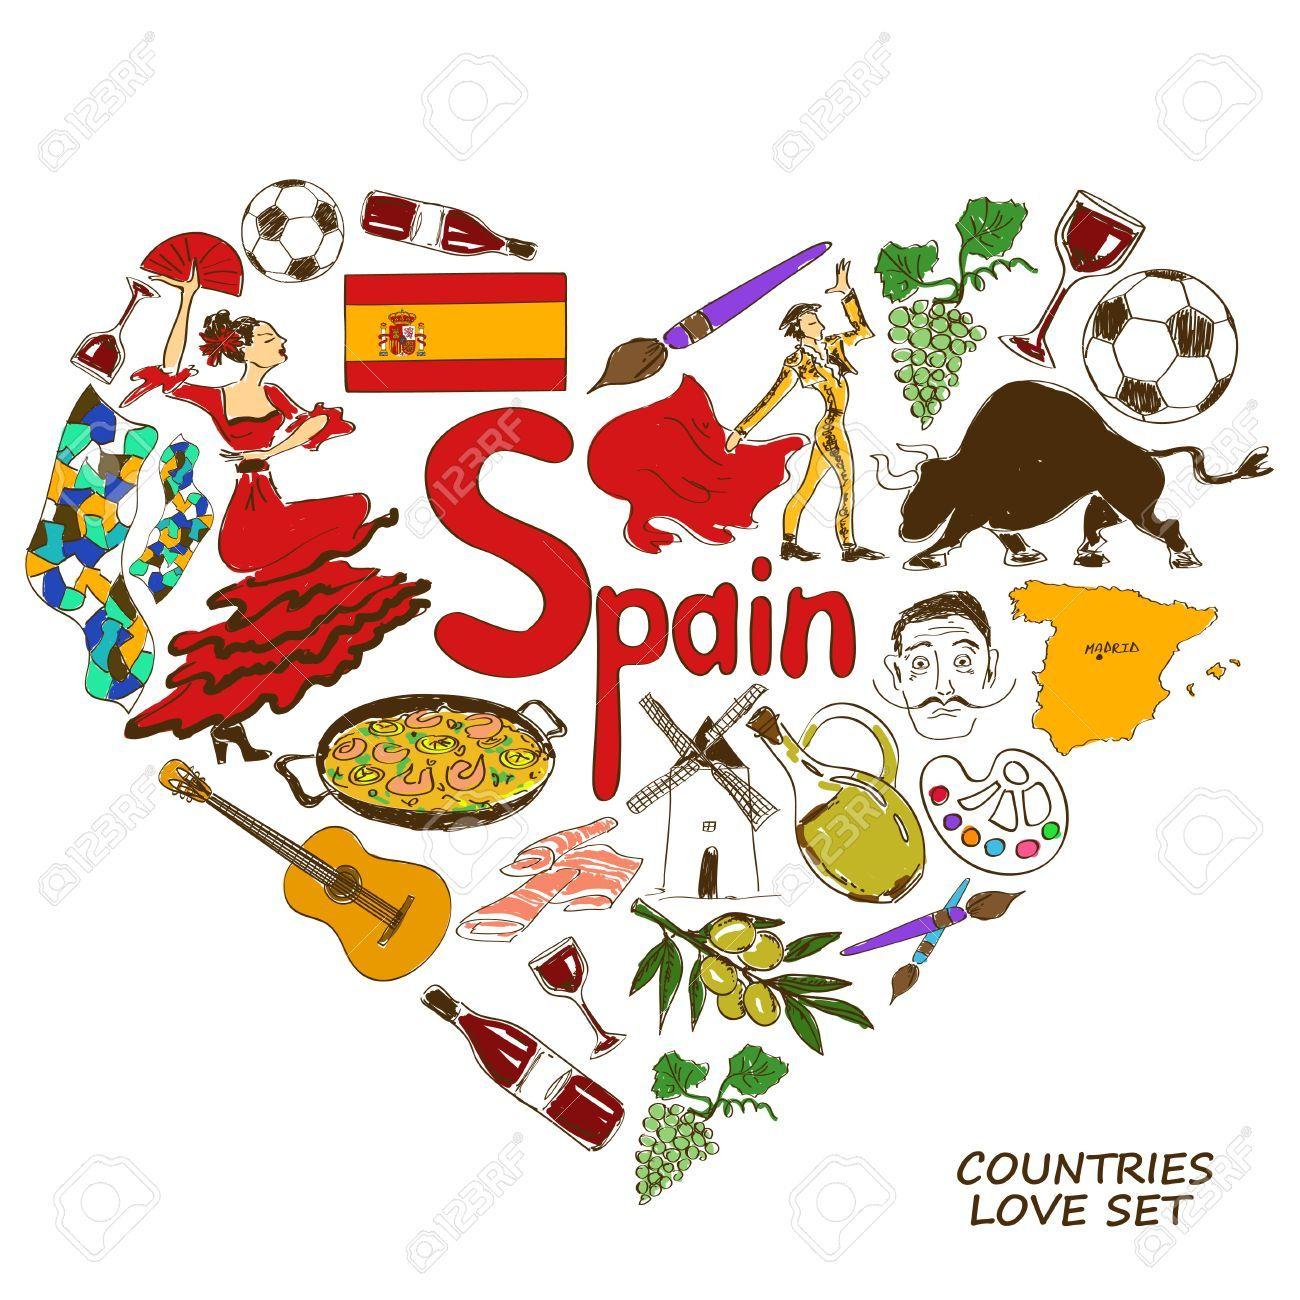 Stock Photo | Symbole Espagnol, Croquis Et Espagnol avec Dessin D Espagne